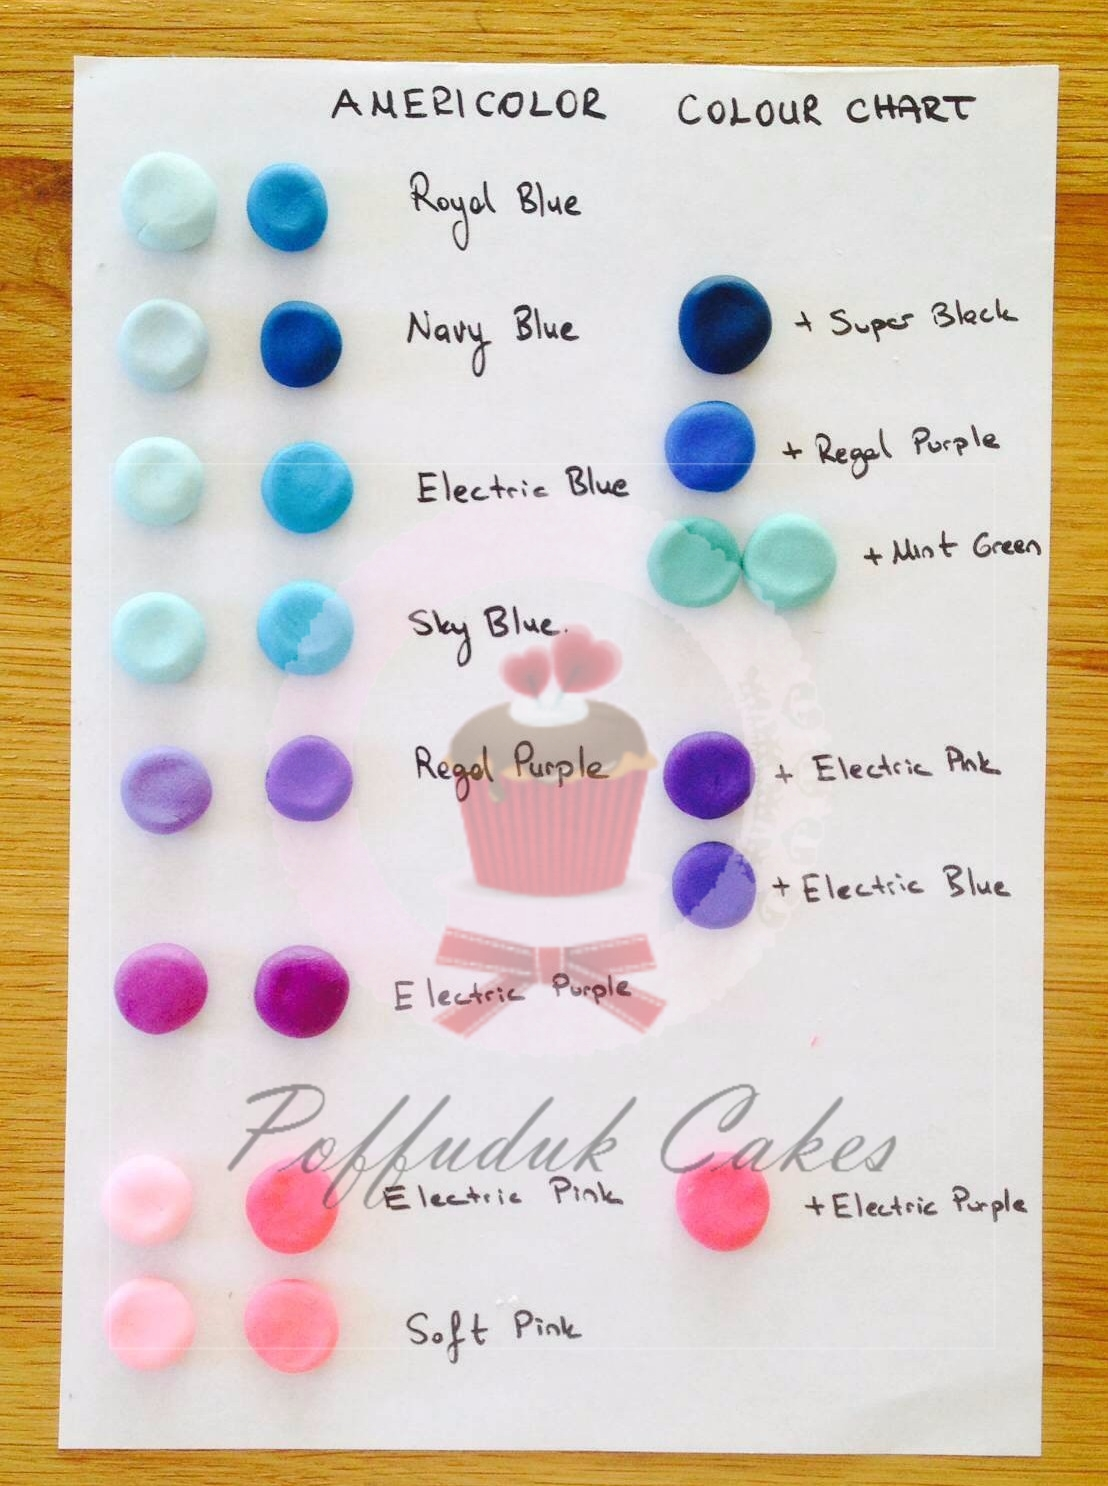 Americolor Gel Food Coloring Chart Food